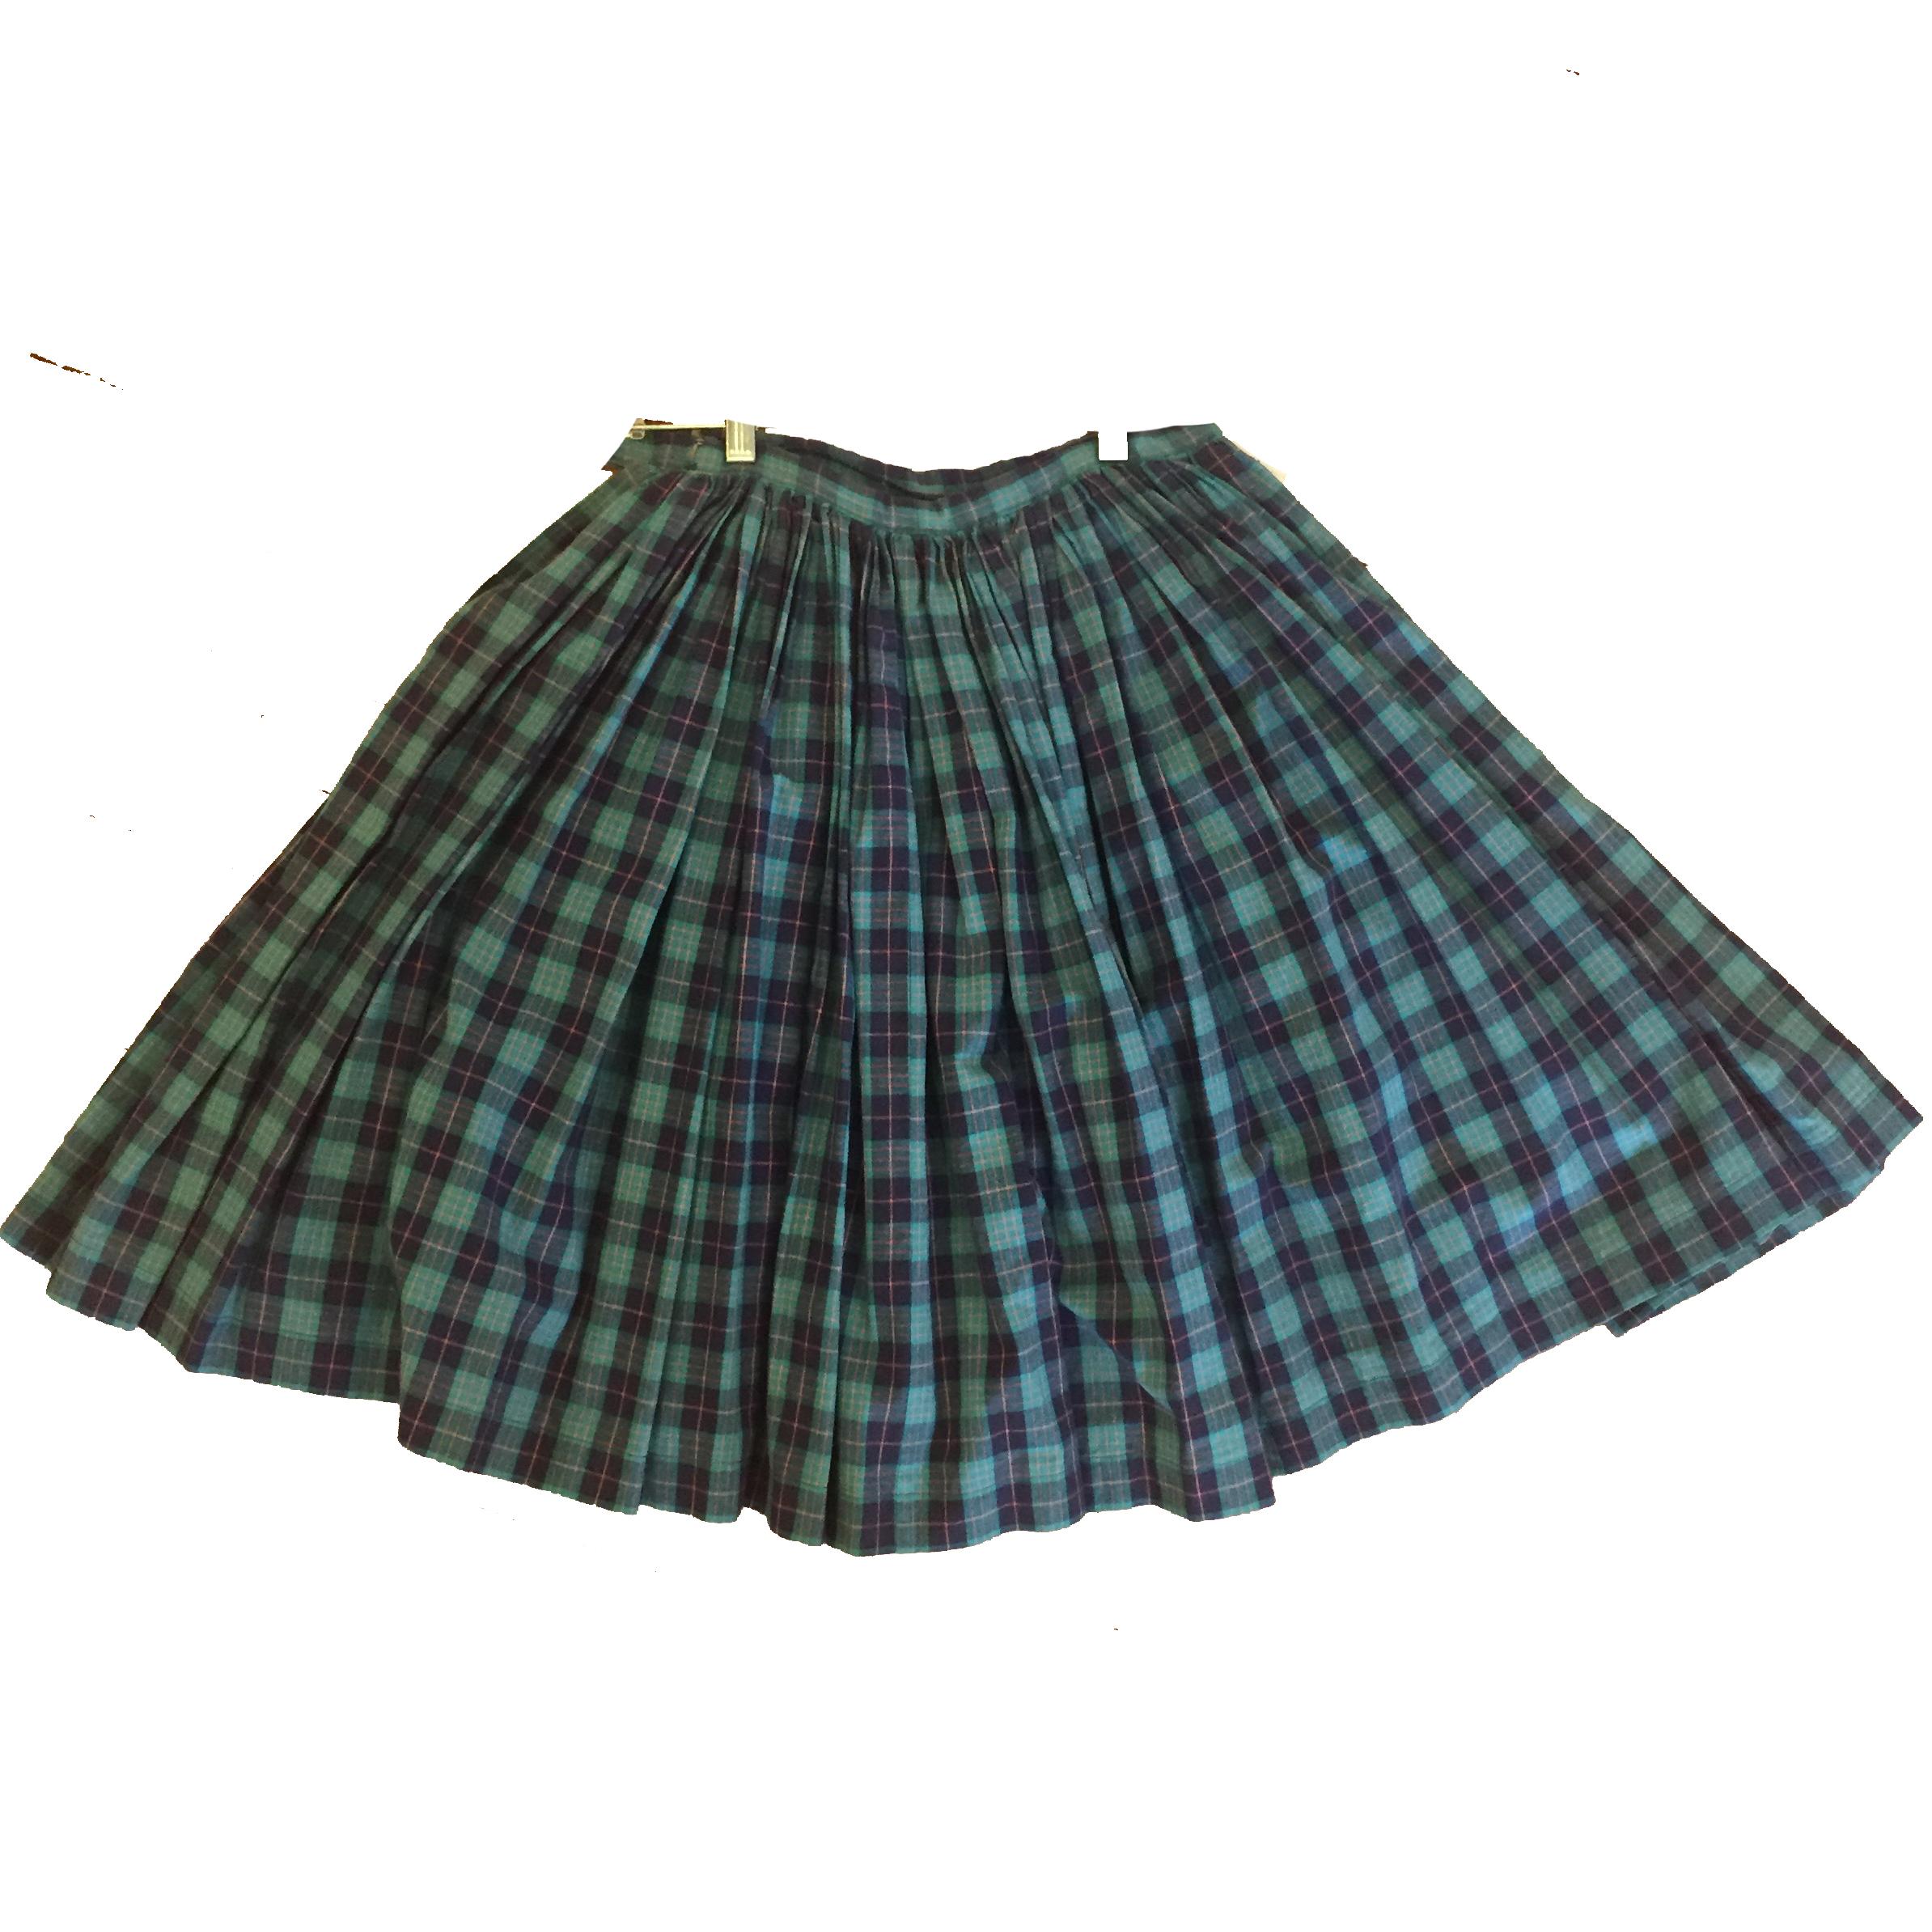 blowjob-cumshot-adult-plaid-skirt